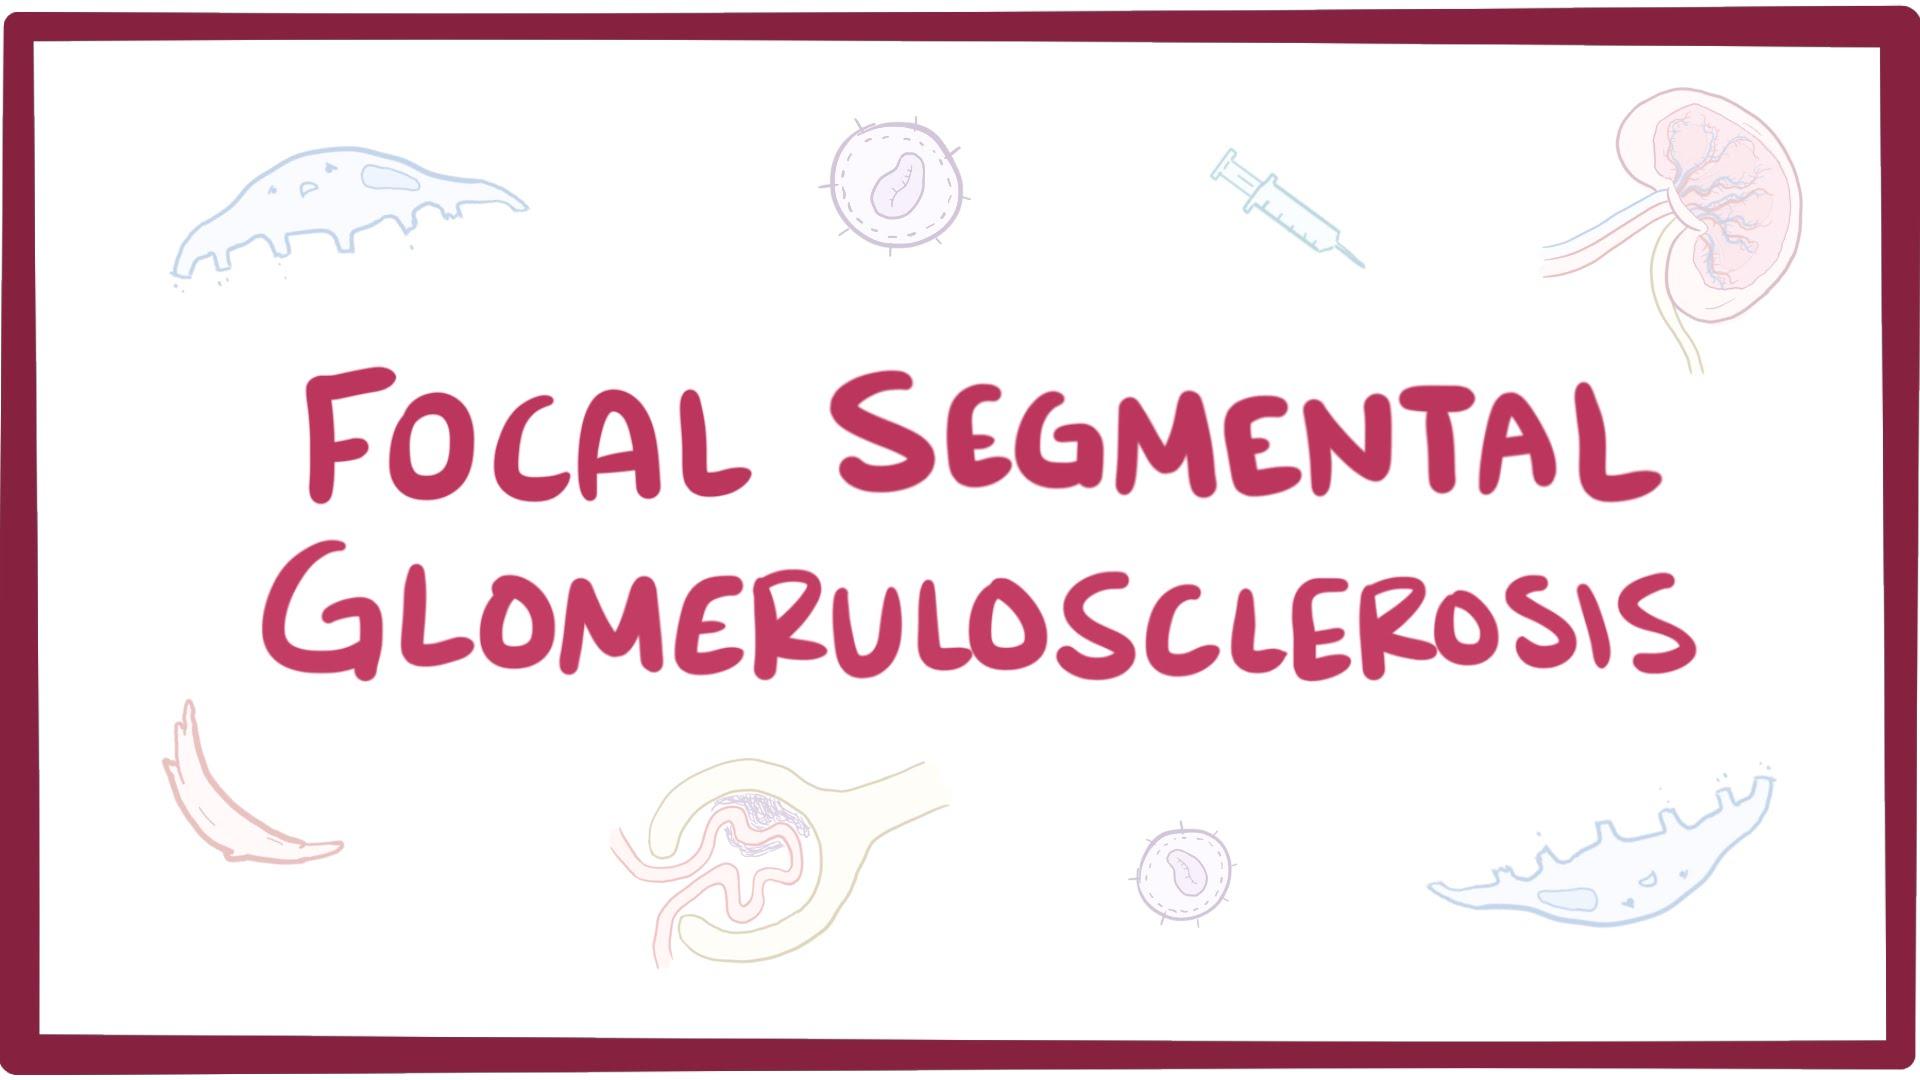 fokal segmentell glomeruloskleros